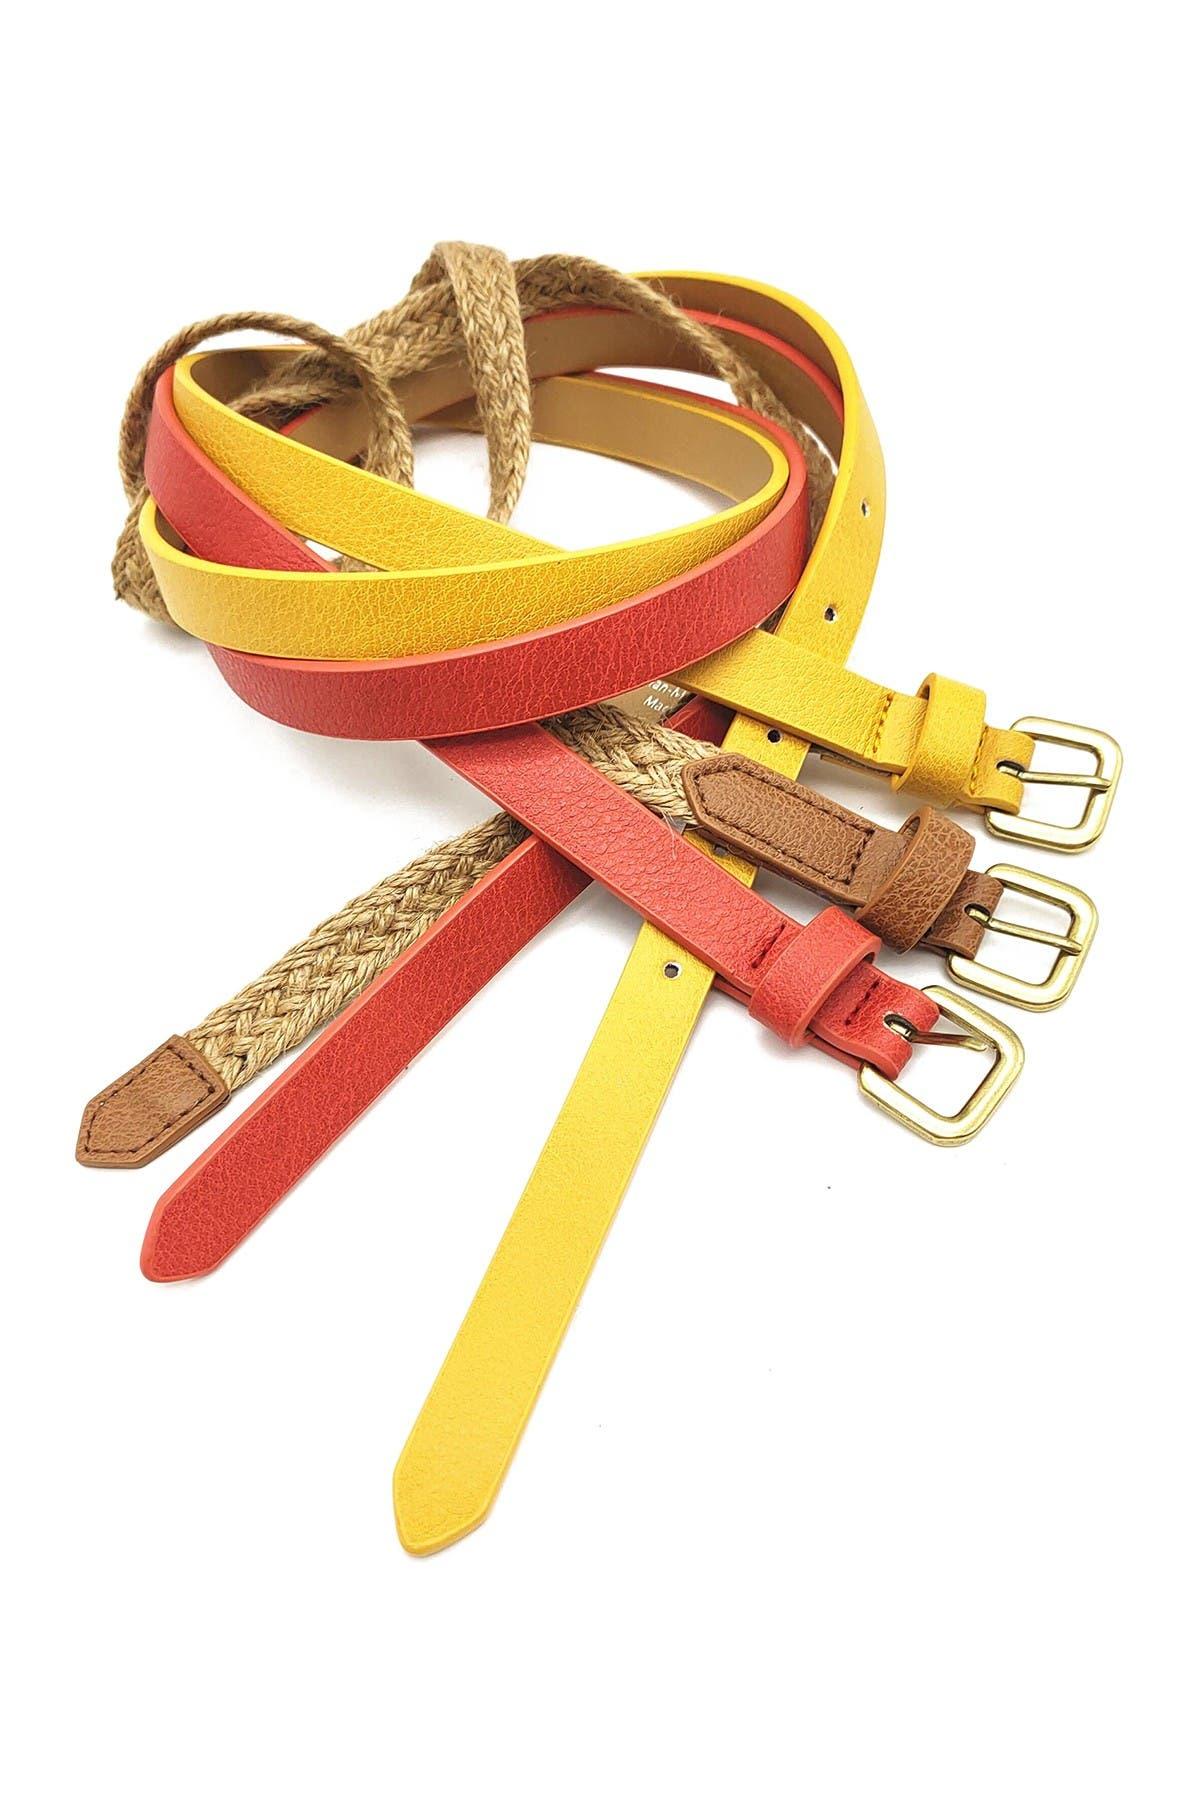 Image of Linea Pelle Skinny Belts - Pack of 3